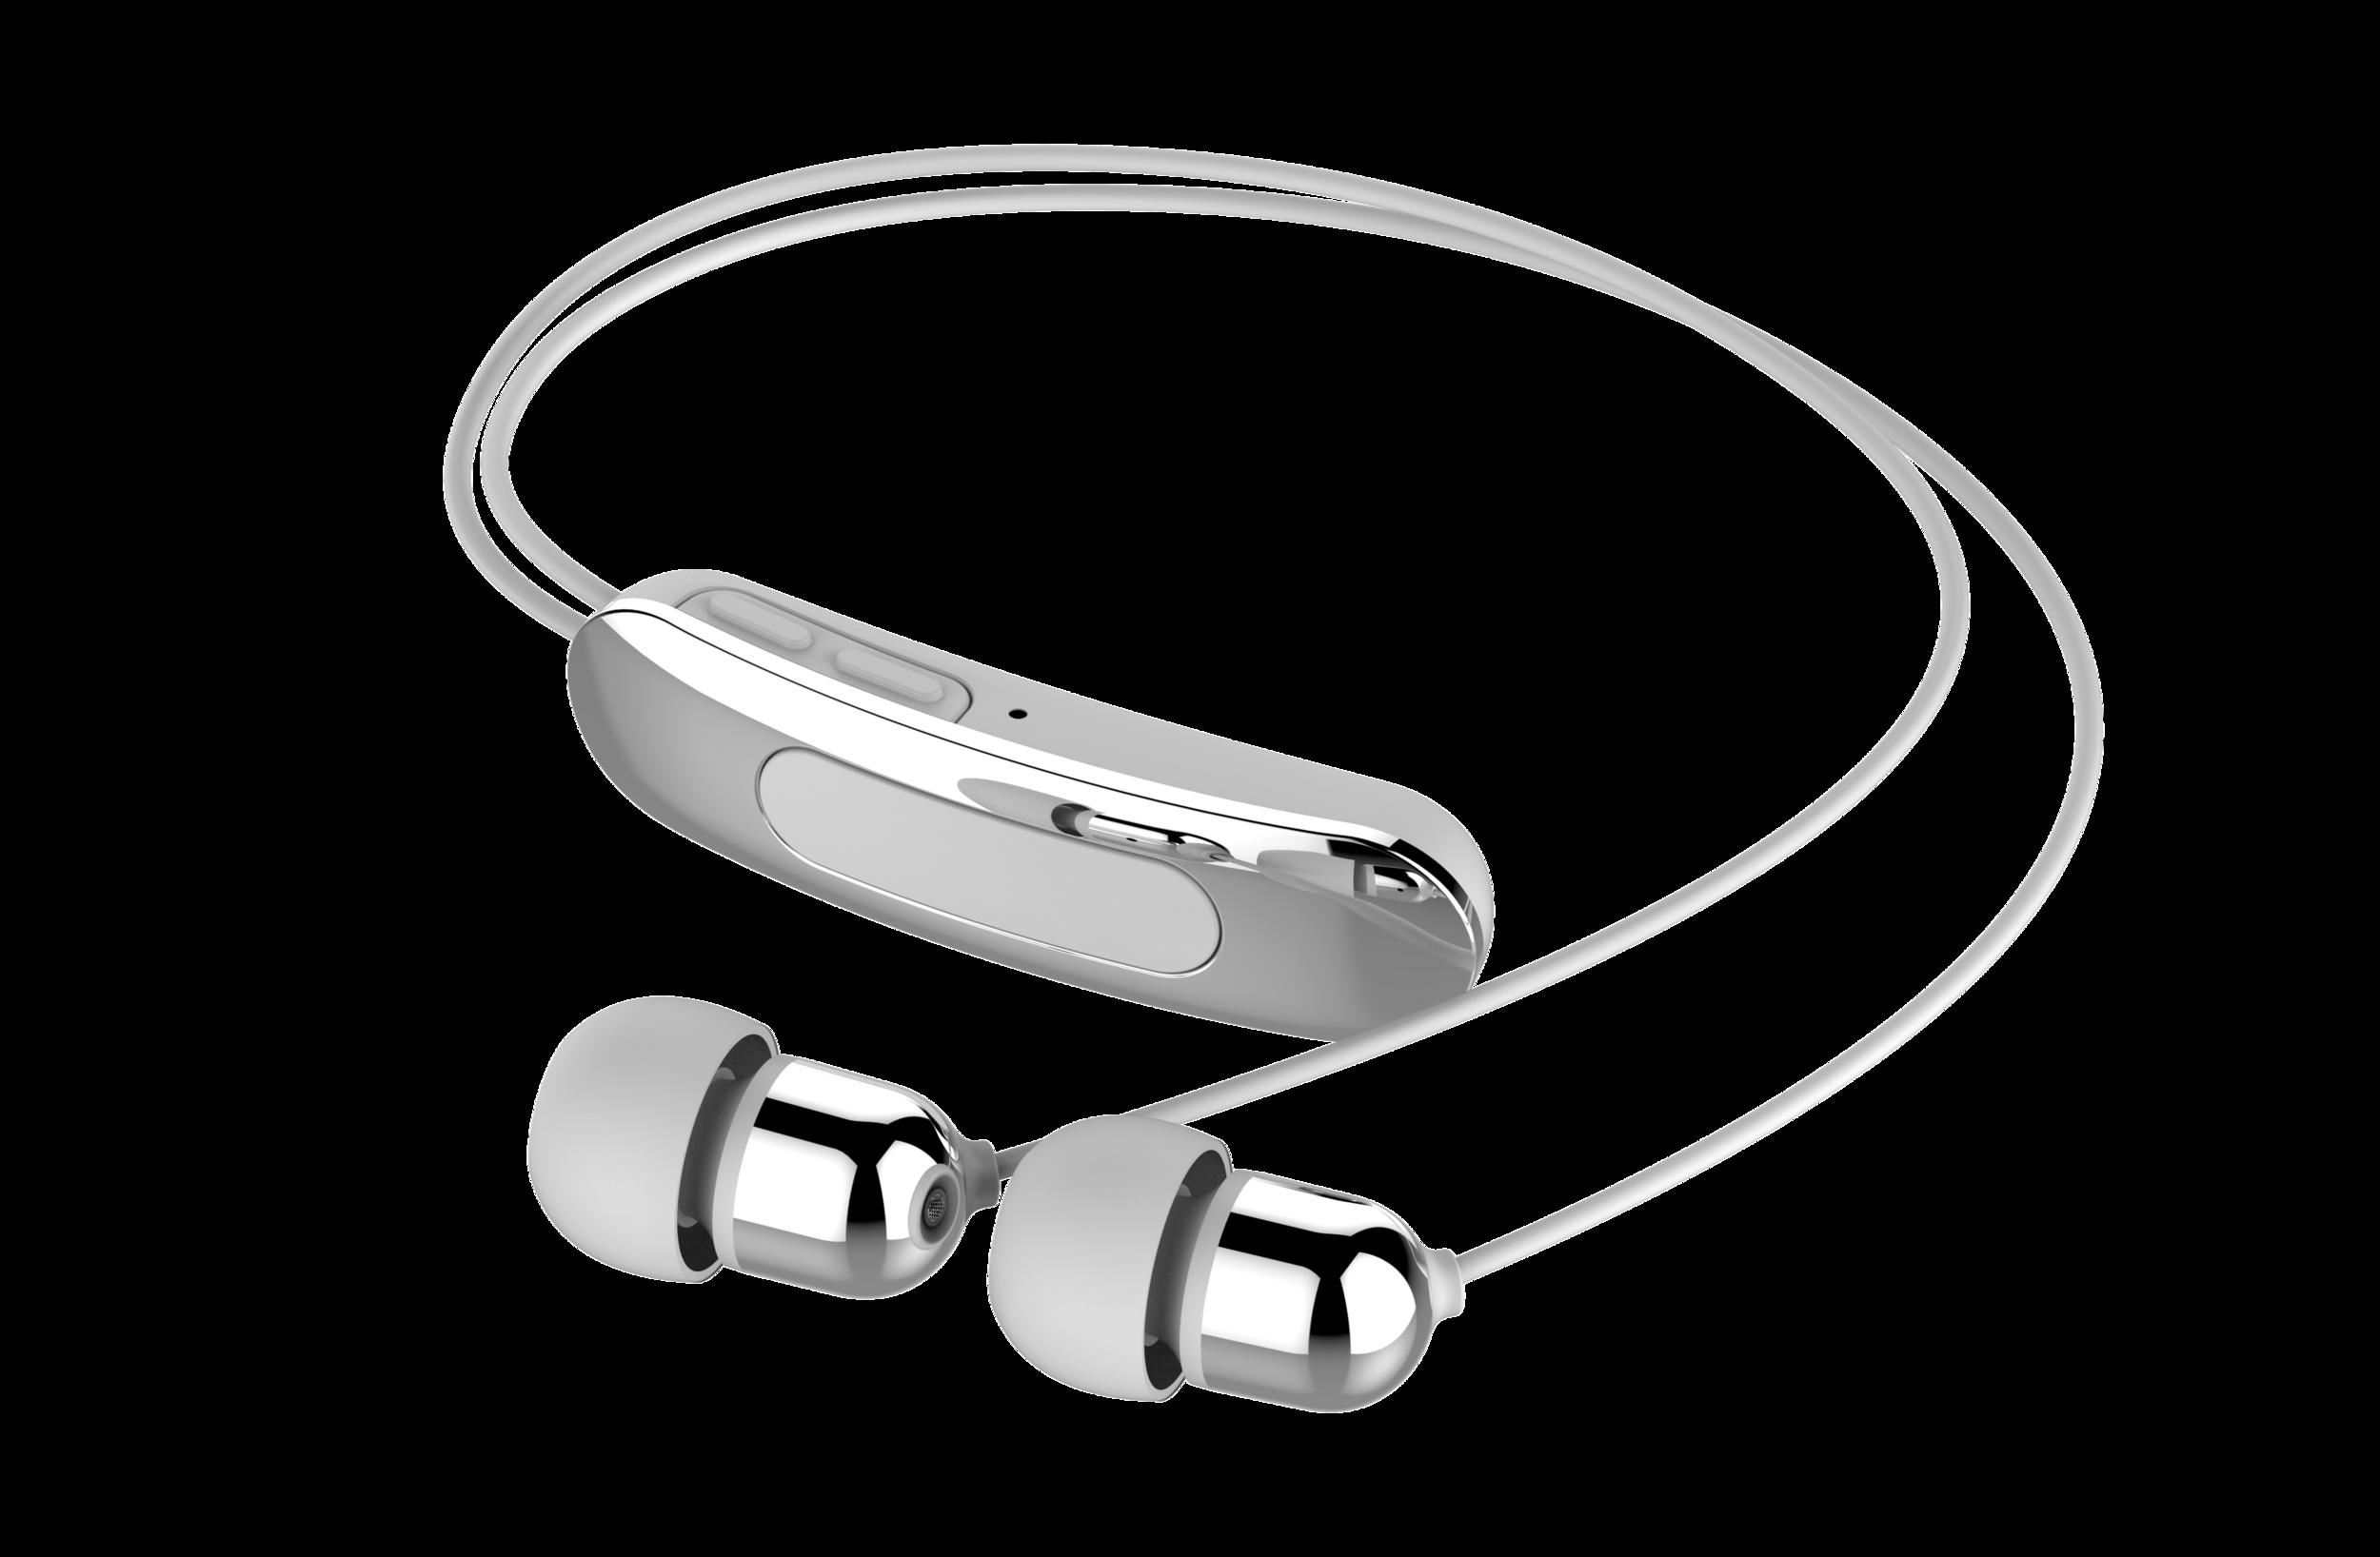 helix-headset-whitesilver-5.png